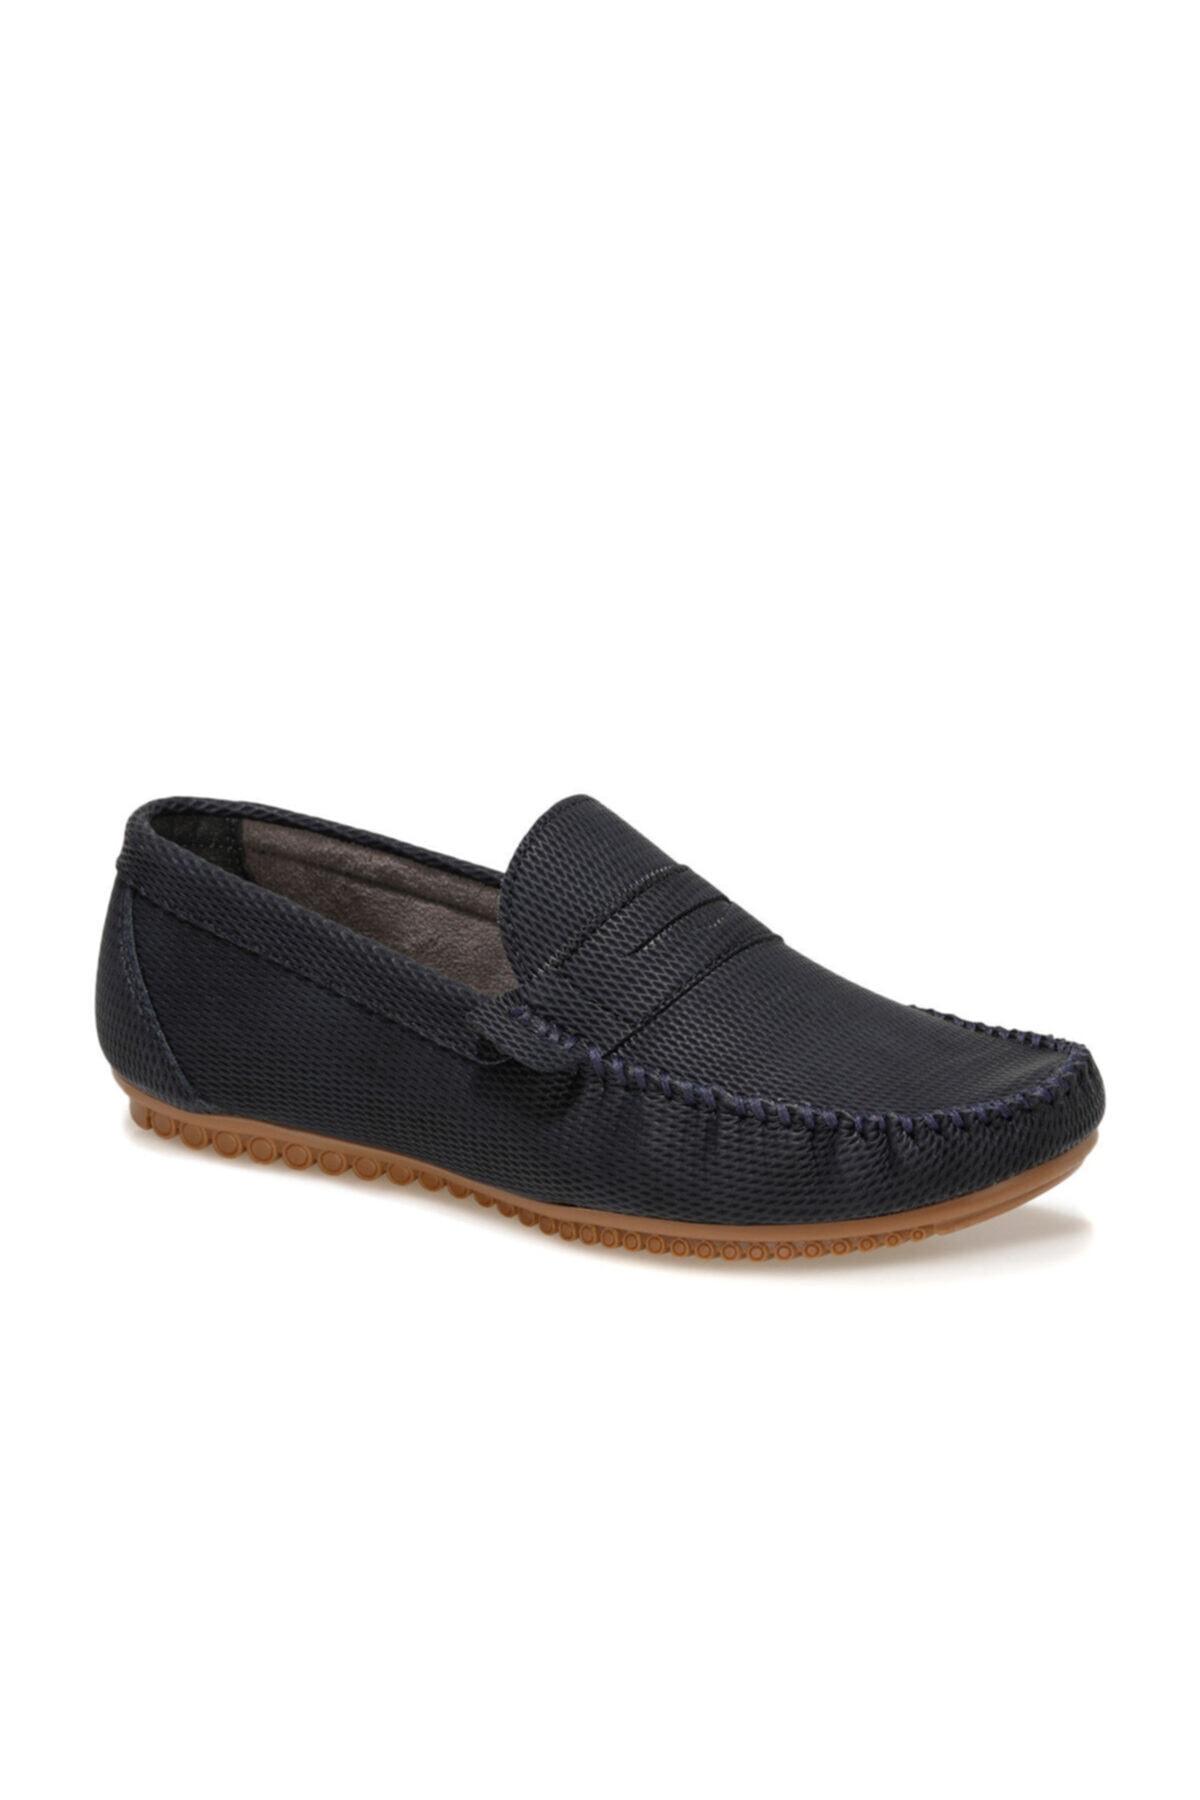 OXIDE MDL2 1FX Lacivert Erkek Loafer Ayakkabı 100910536 1